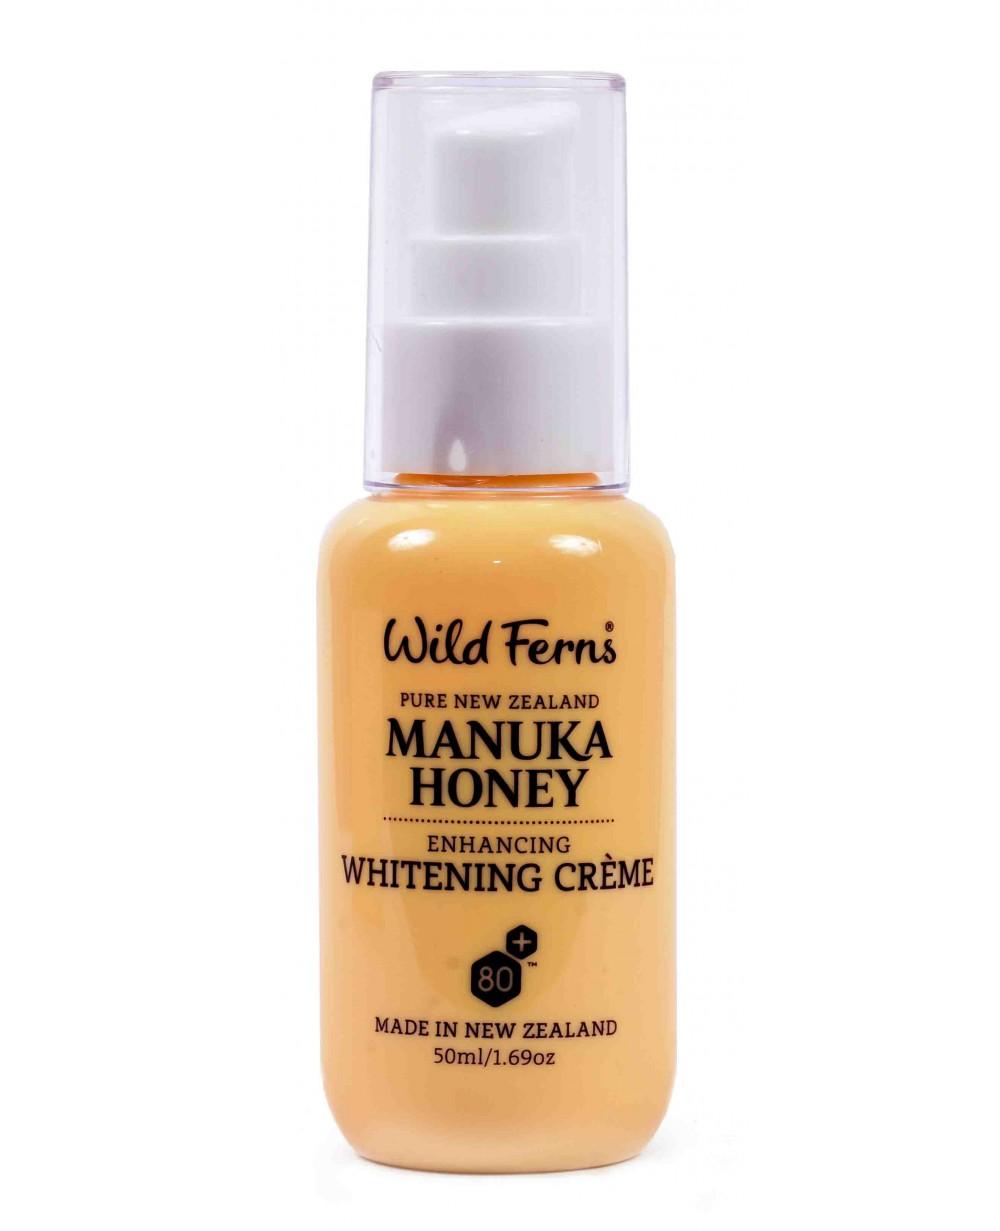 WILD FERNS MANUKA HONEY WHITENING CREAM 50 ML